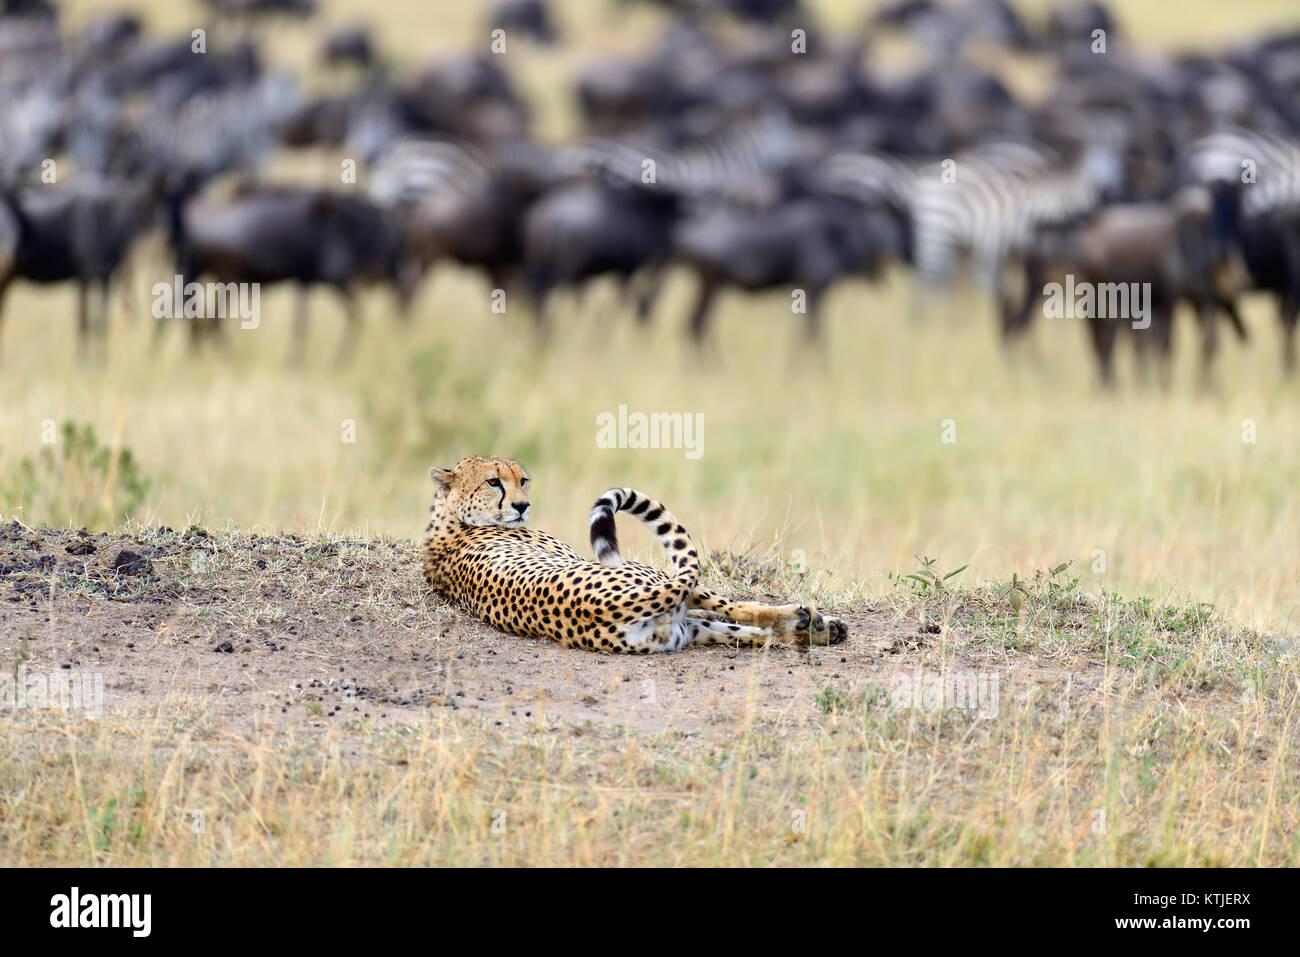 Guepardos salvajes africanos, hermosos animales mamíferos. África, Kenia Imagen De Stock